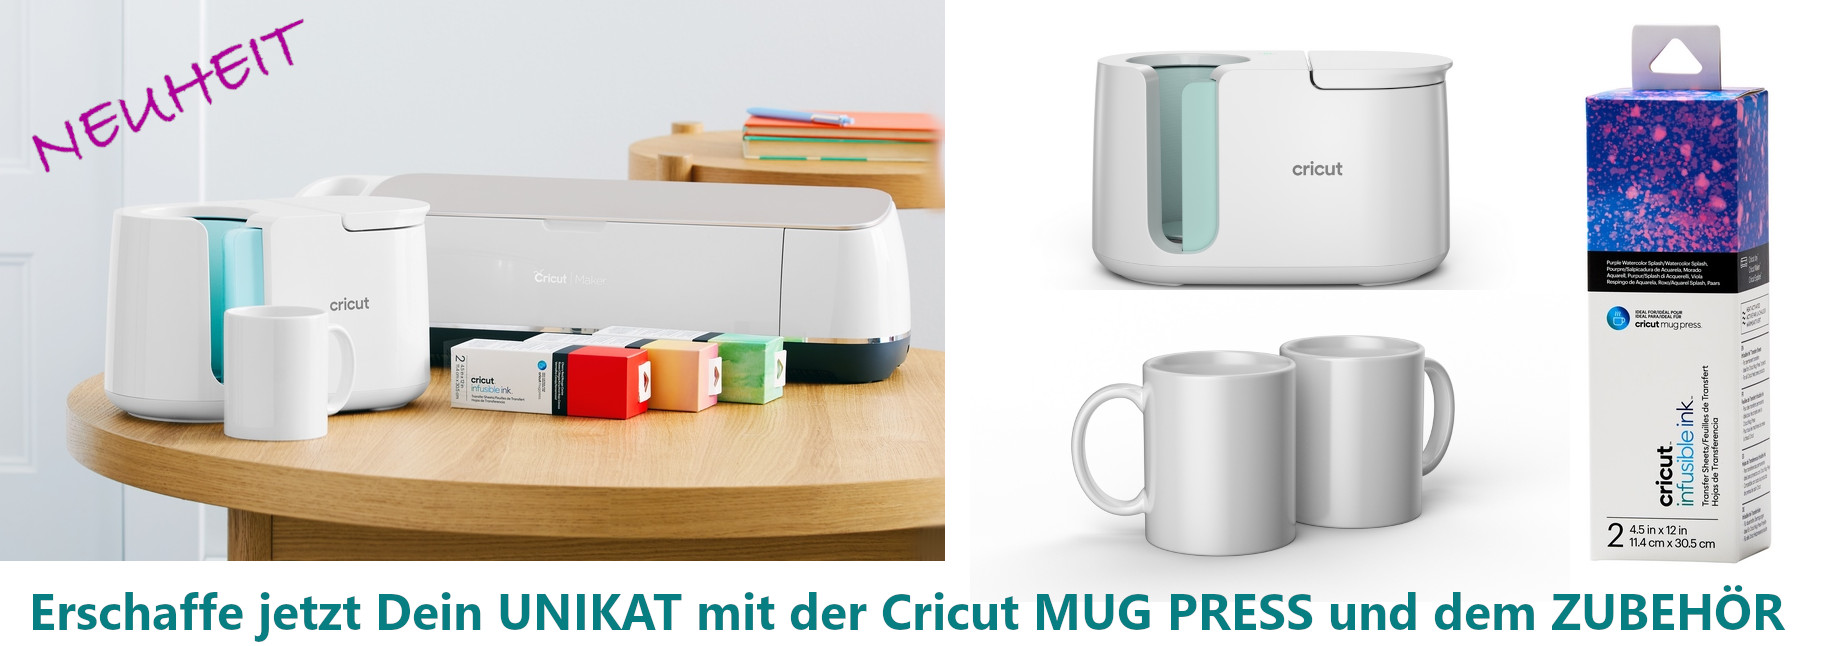 Cricut Neuheit MUG PRESS